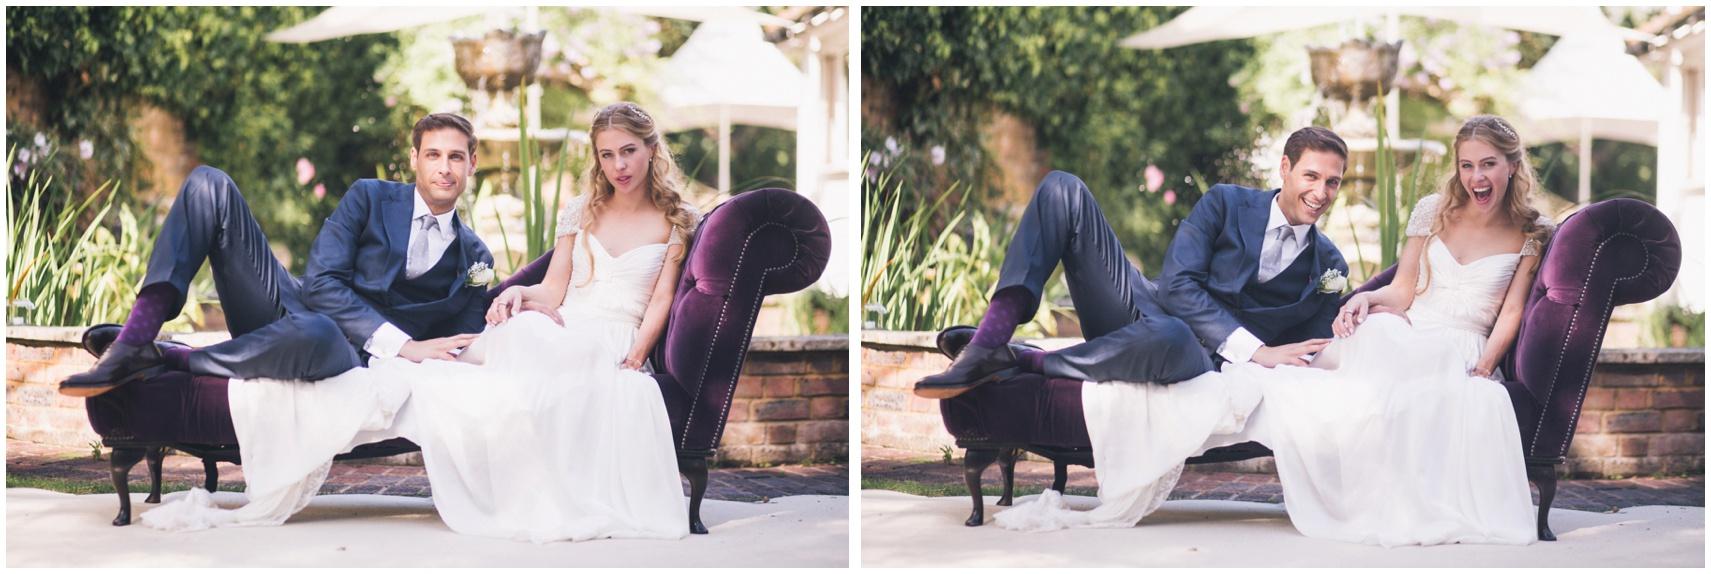 BMC Wedding photography Rutland_0304.jpg